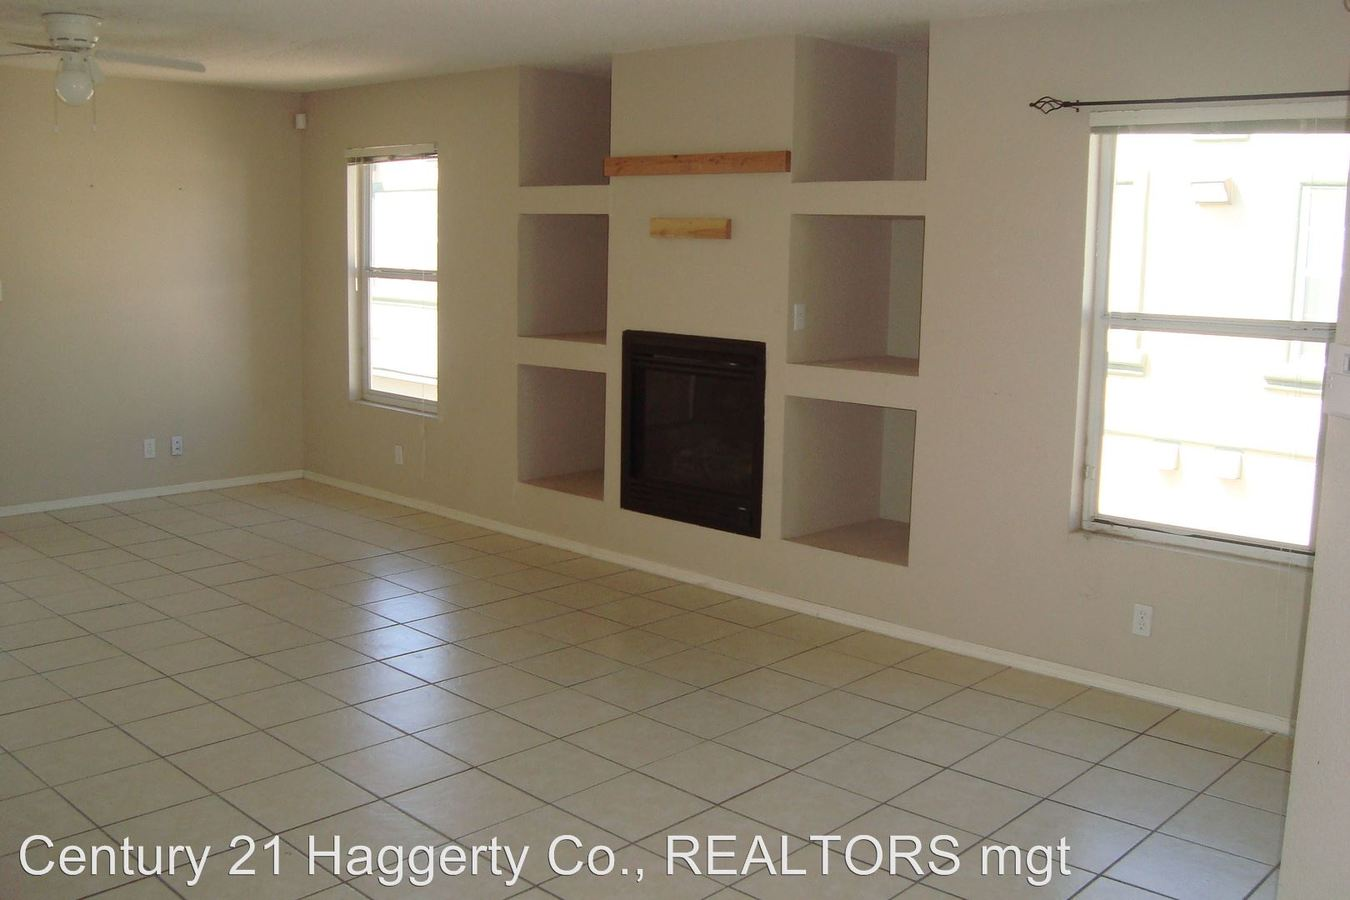 3 Bedrooms 2 Bathrooms Apartment for rent at 5064 Salem in El Paso, TX